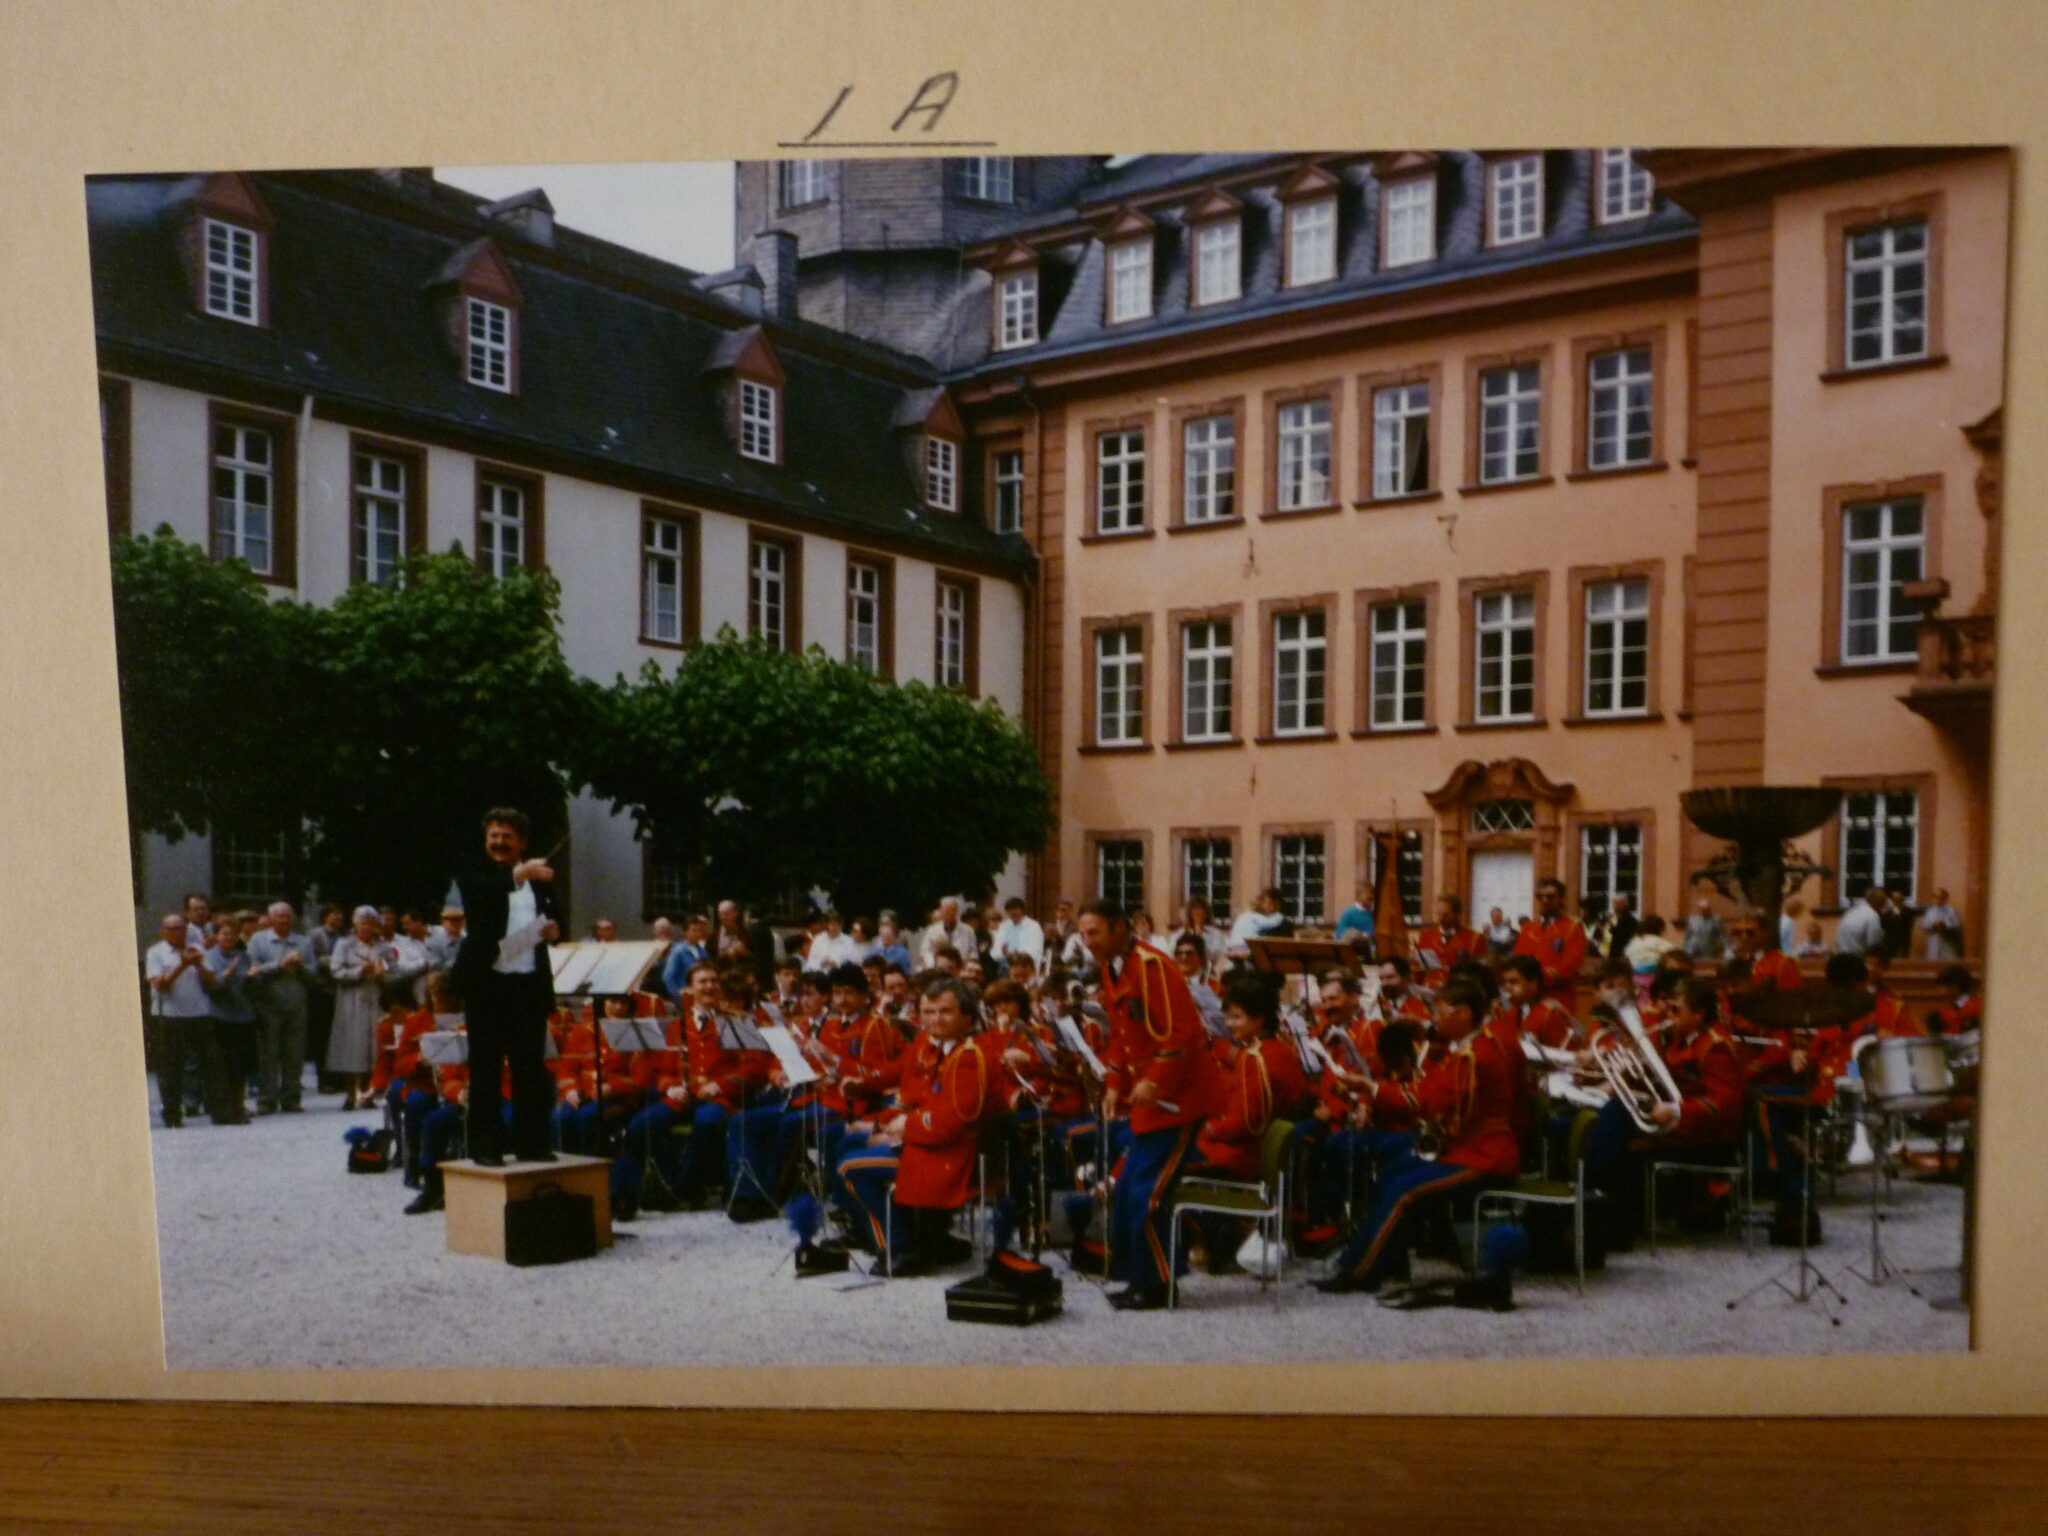 Concert in Bad Berleburg